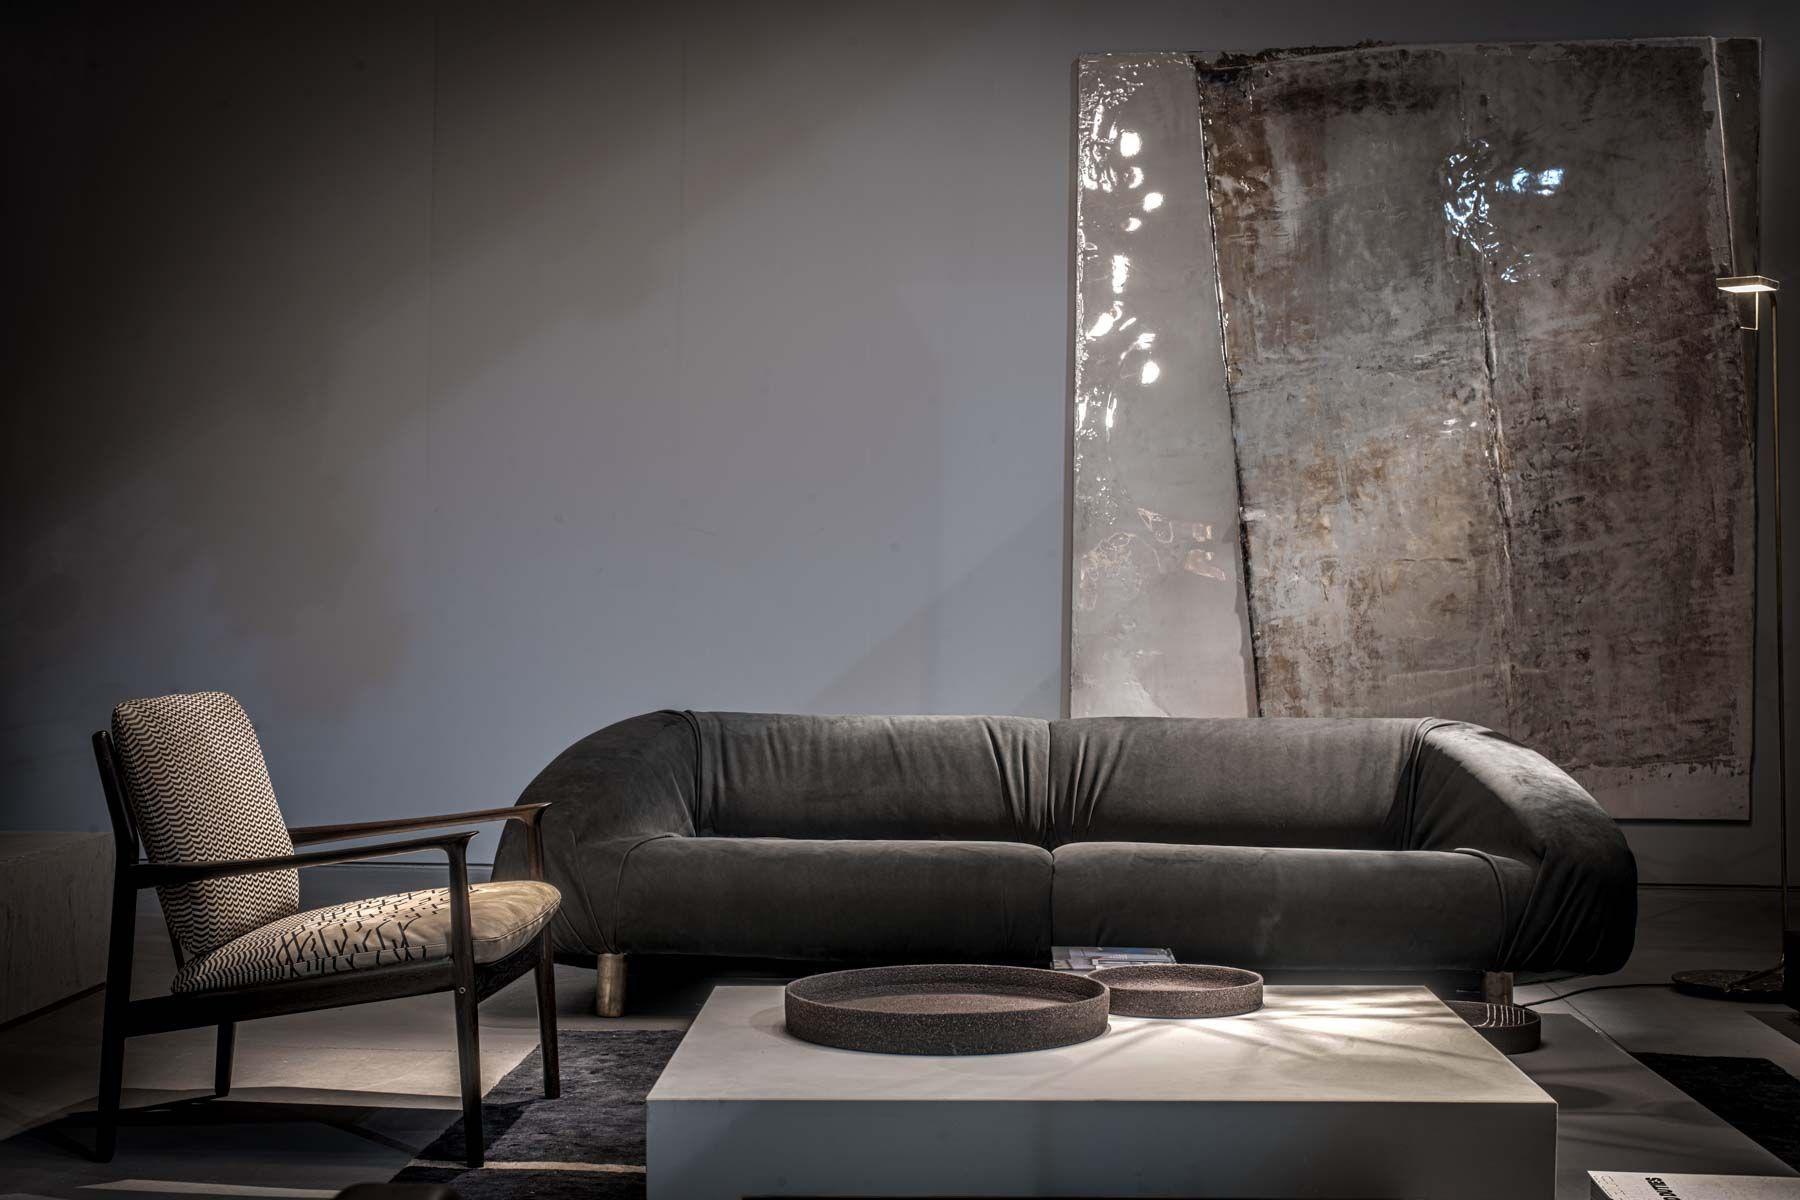 Baxter Fold Jenga Unique With Images Sofa Design Interior Design Home Decor